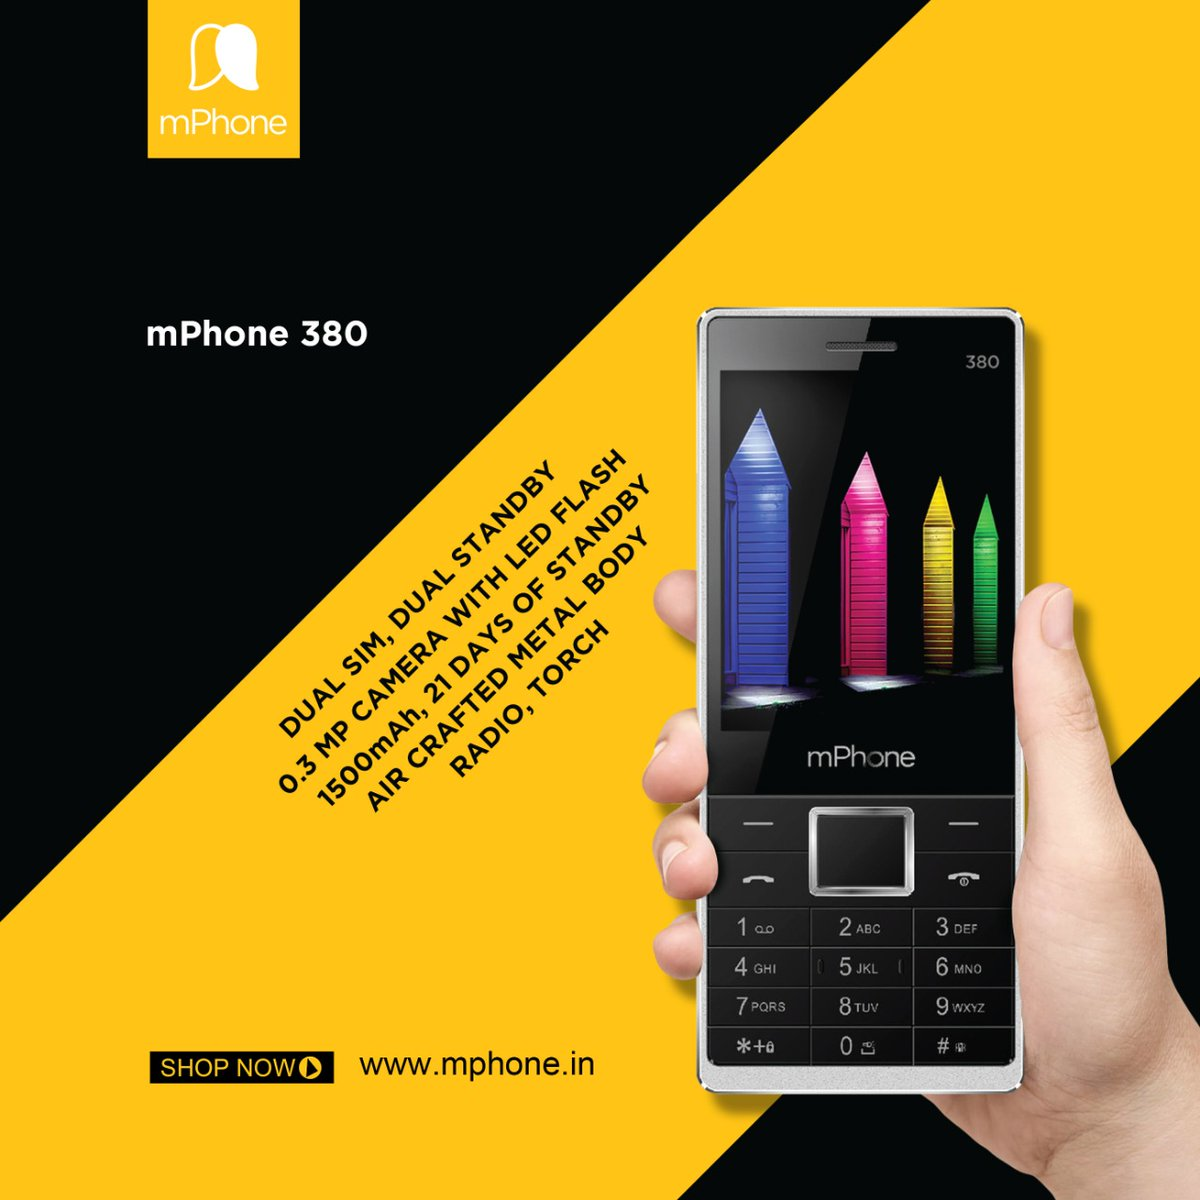 Choose the best Technology #mPhone280 #mPhone #mangophone #mangosmartphone #smartphone #android #androidphone #mangoandroidphone #mobile #mobilephones #keralapic.twitter.com/yQUJLBSsyd